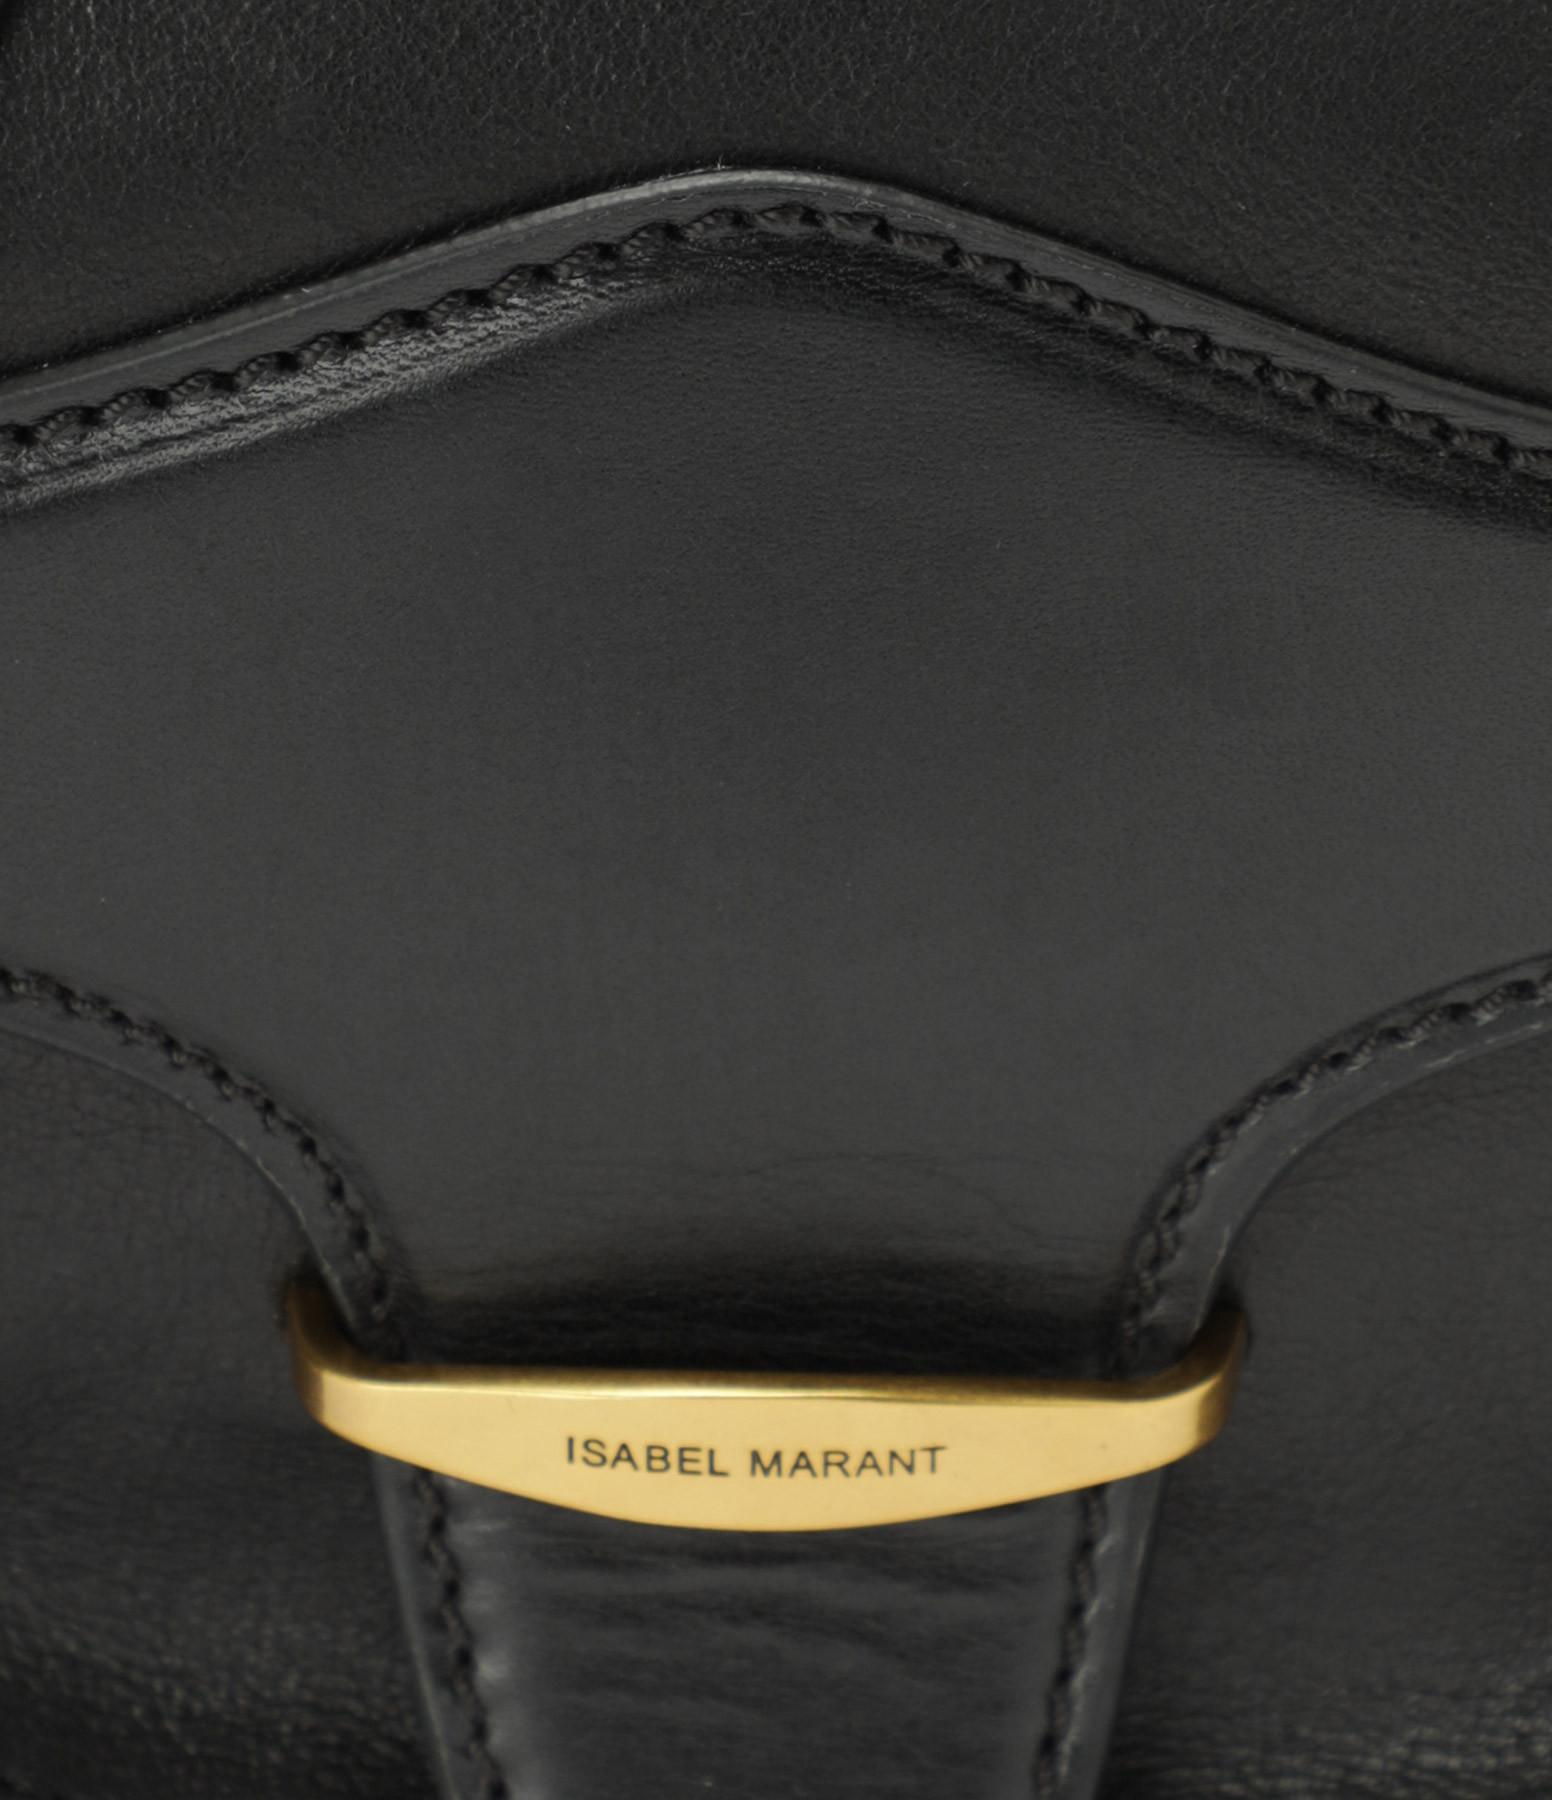 ISABEL MARANT - Sac Botsy Cuir Noir